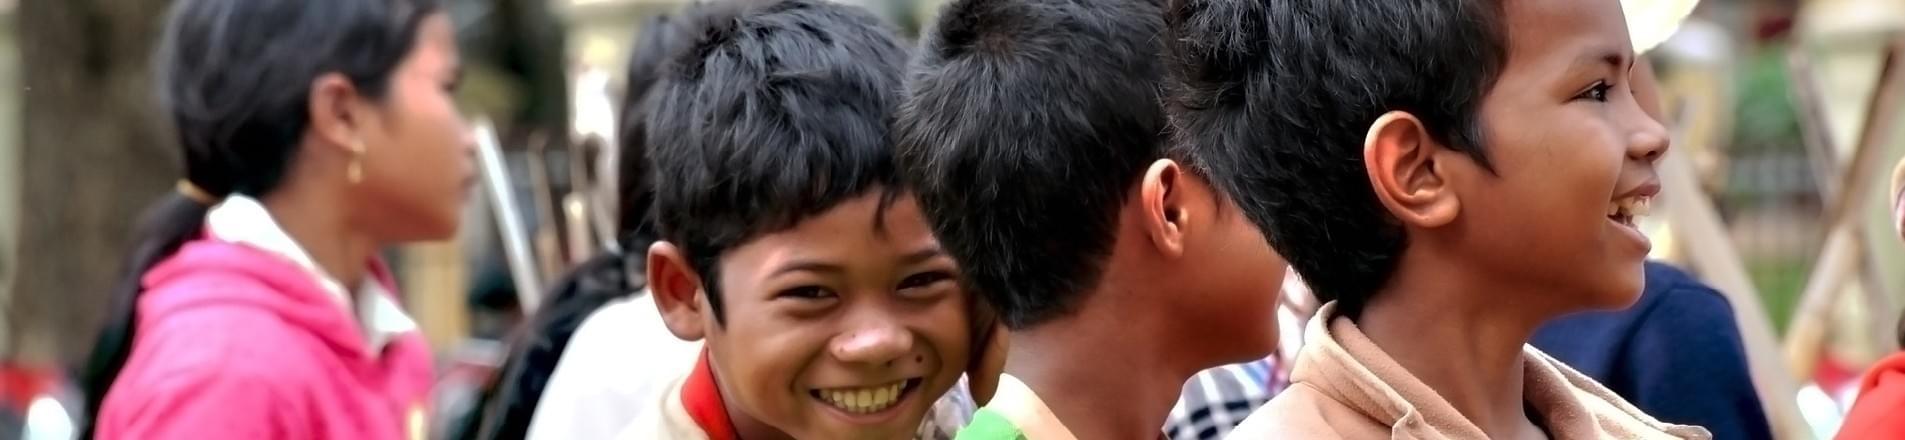 SKY set new target to improve Ethnic Minority representation